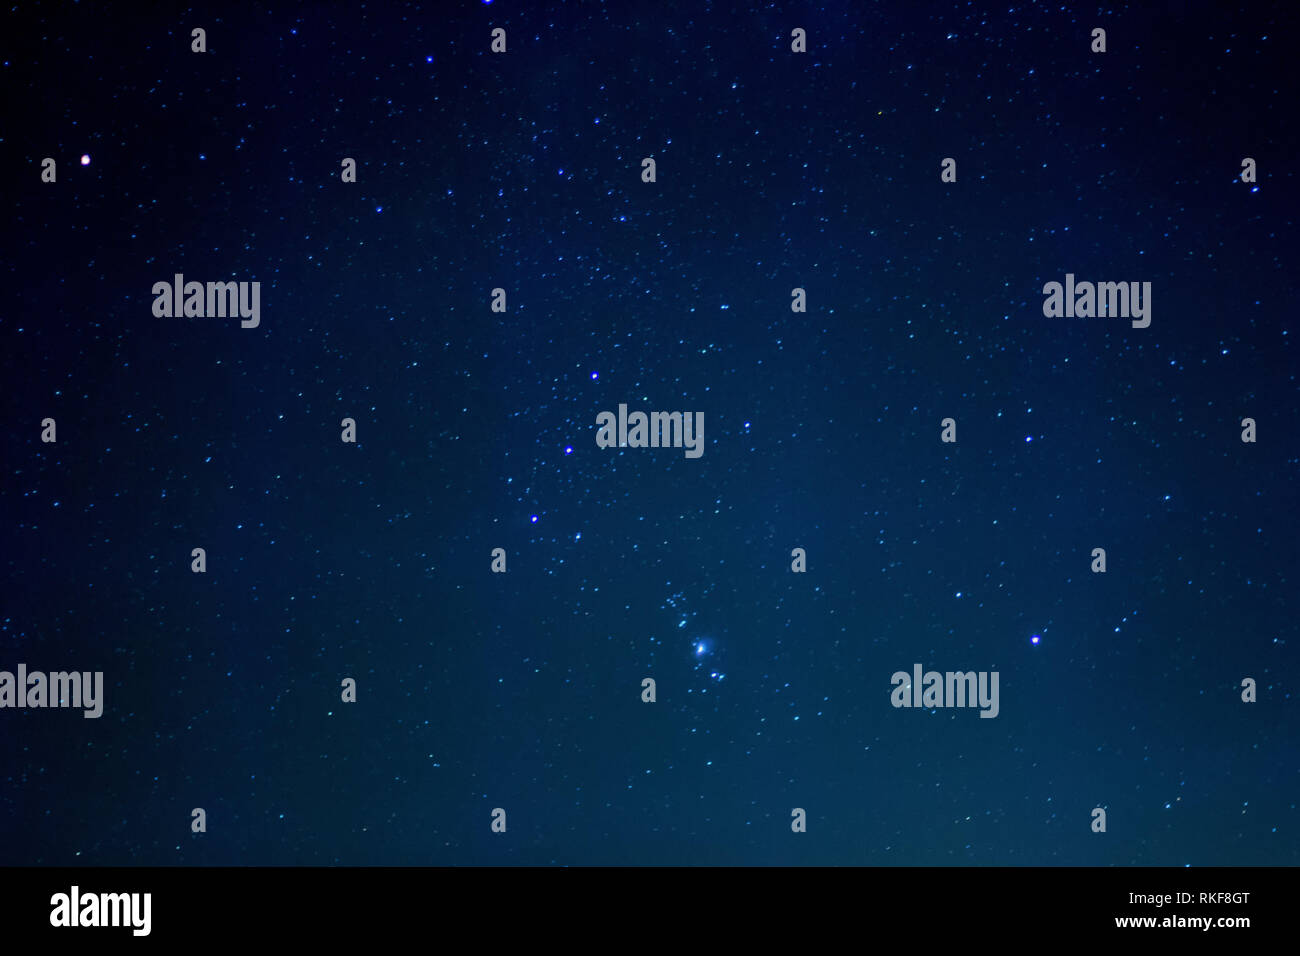 Stars on Firmament - Stock Image